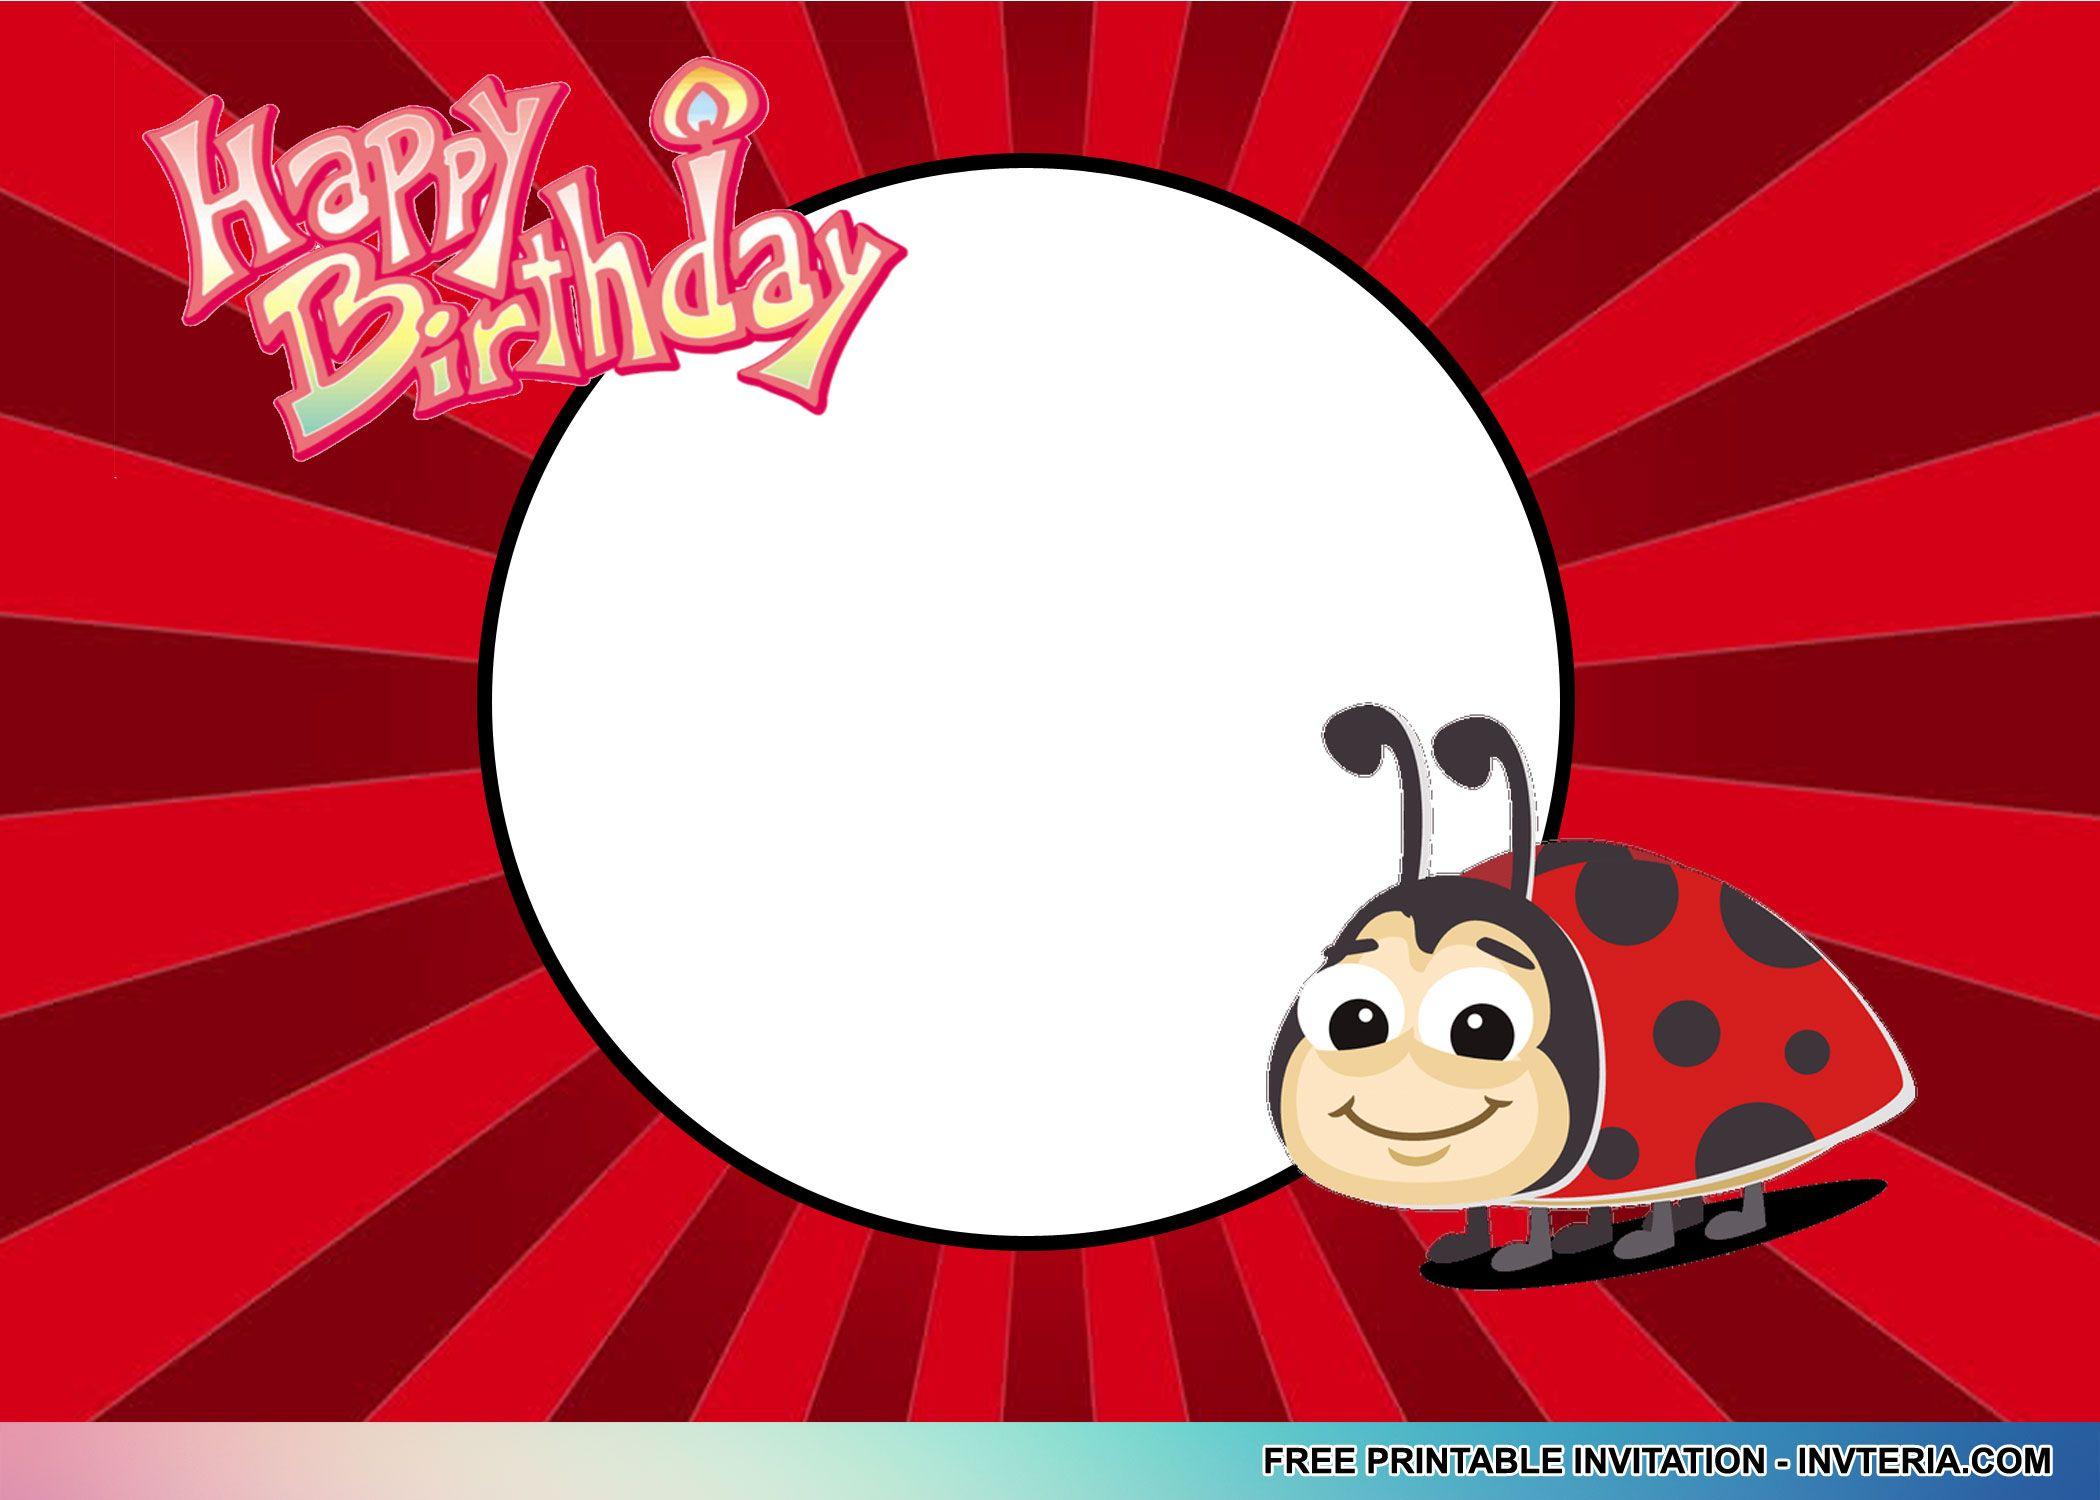 Luxury Ladybug Birthday Invitation Sketch - Invitations and ...